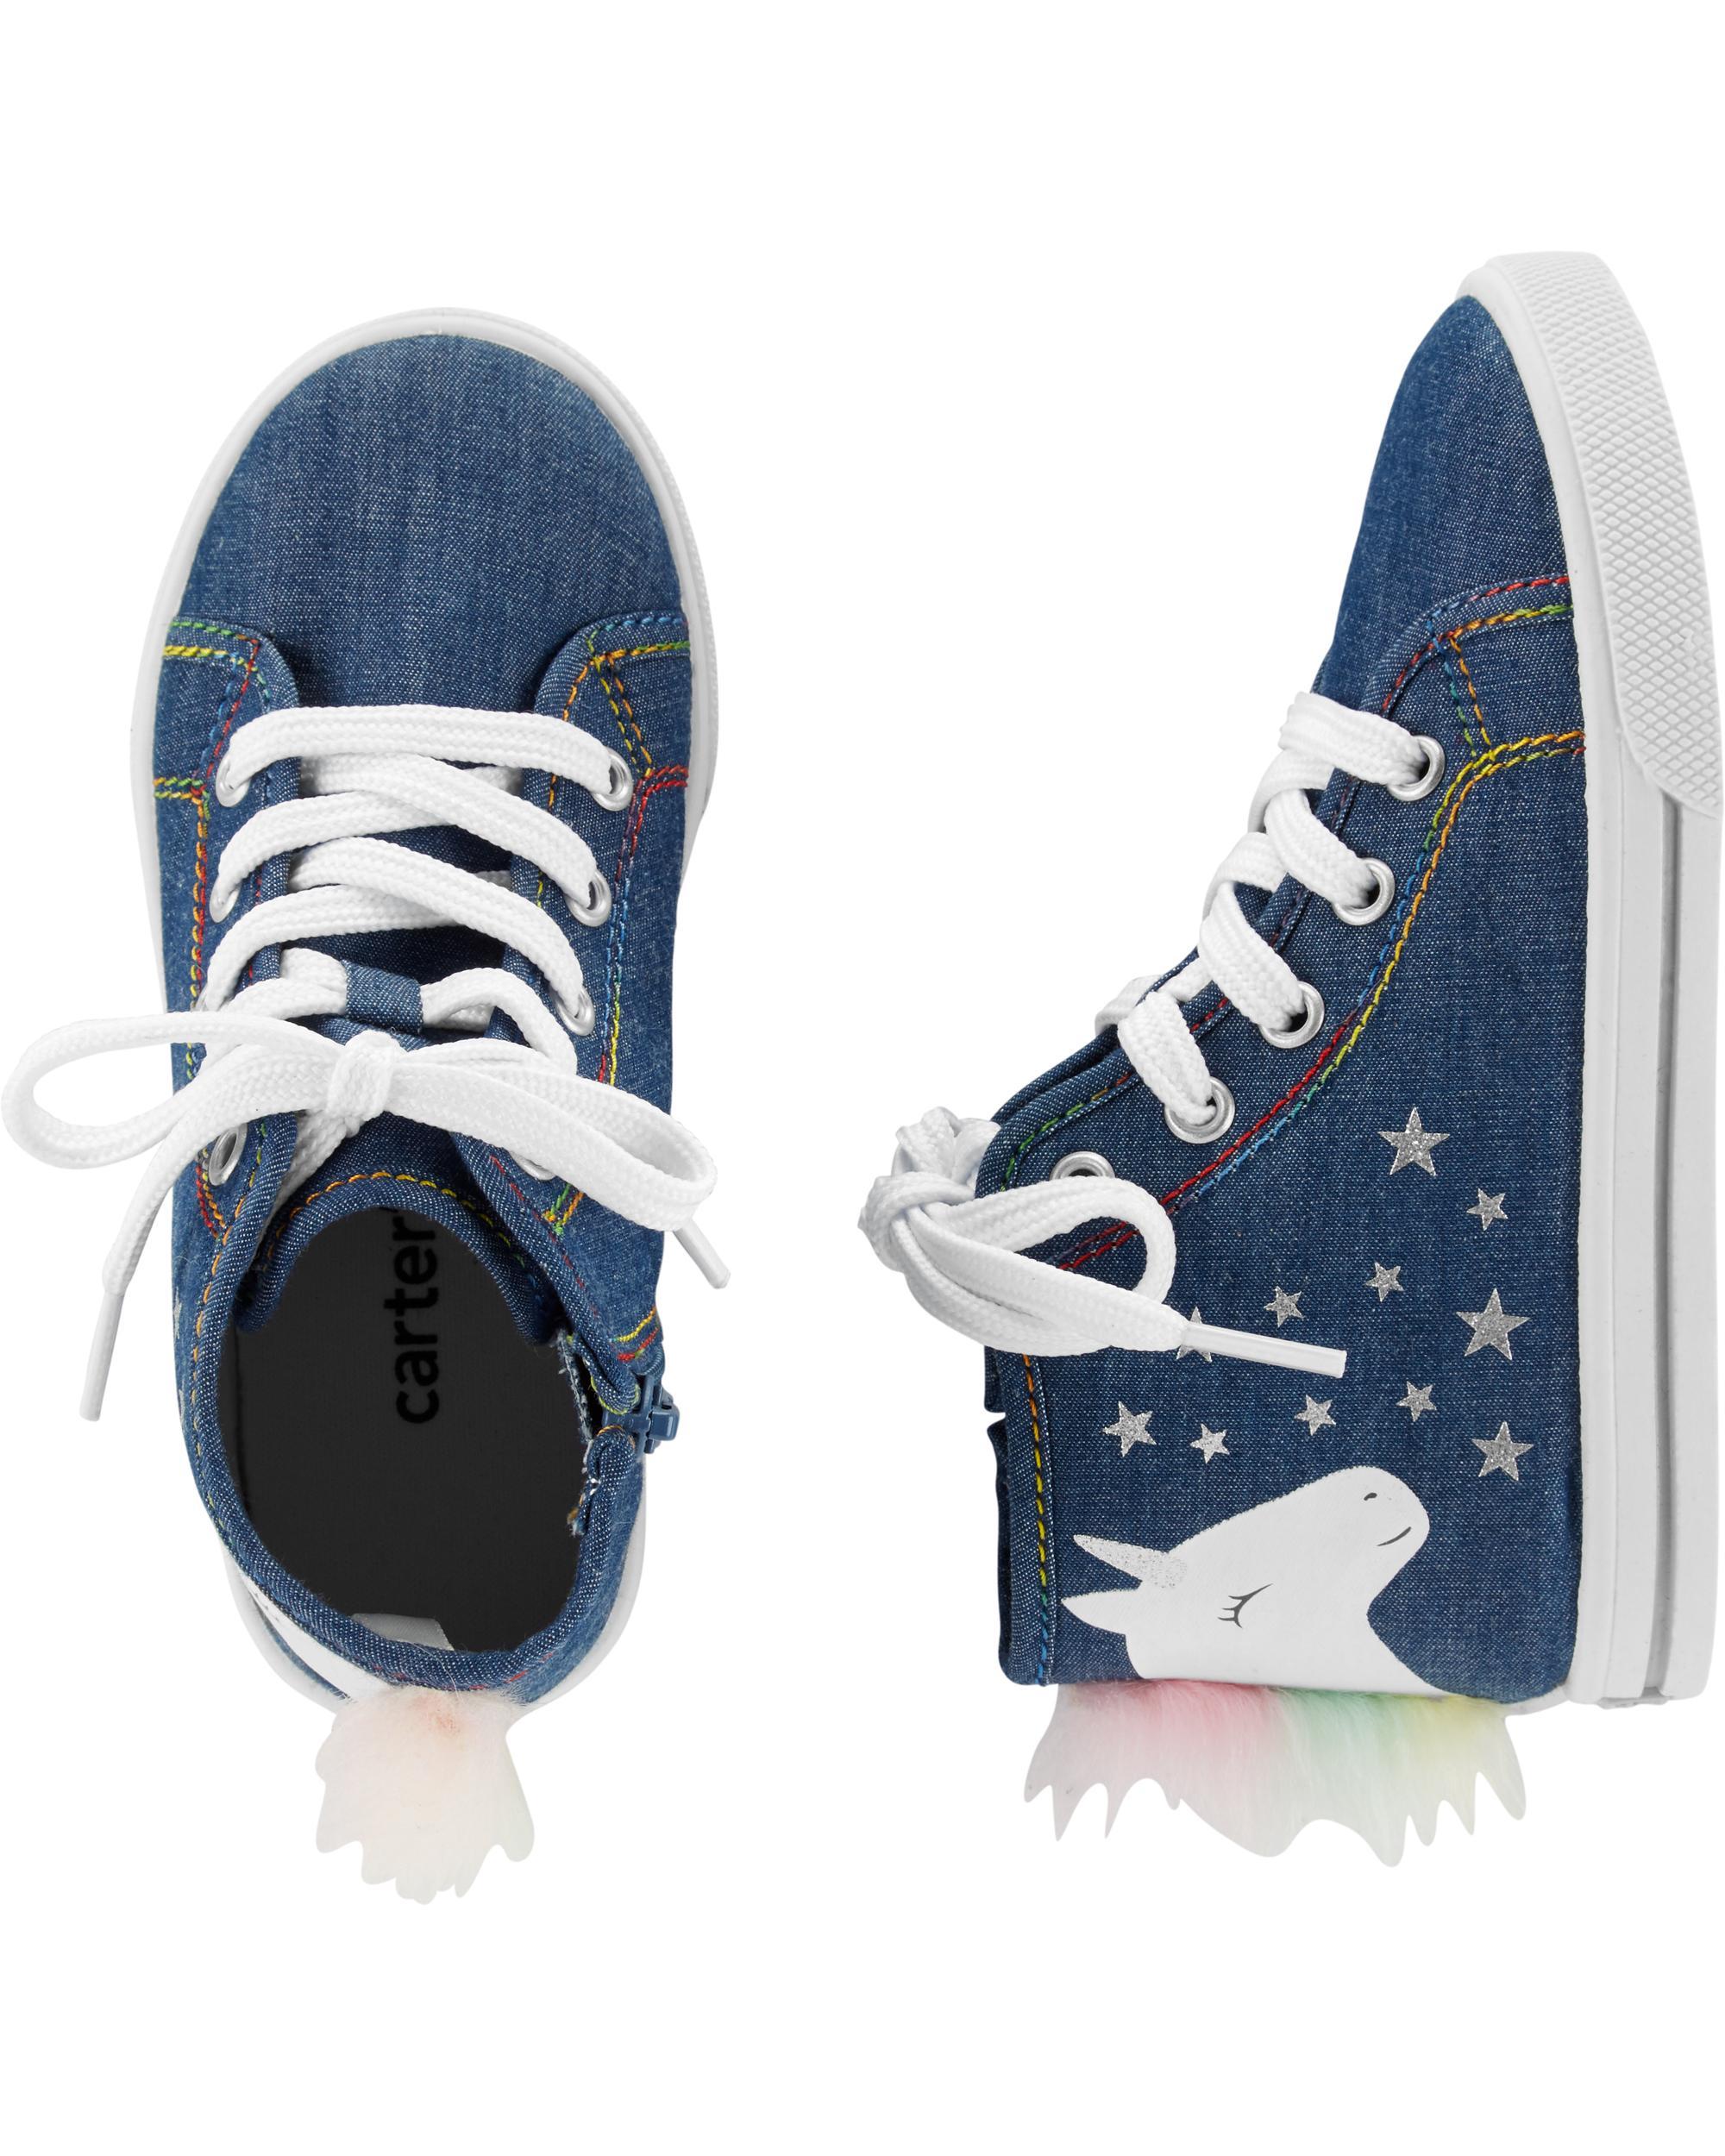 529288d9d9 Carter's Unicorn High Top Sneakers | carters.com